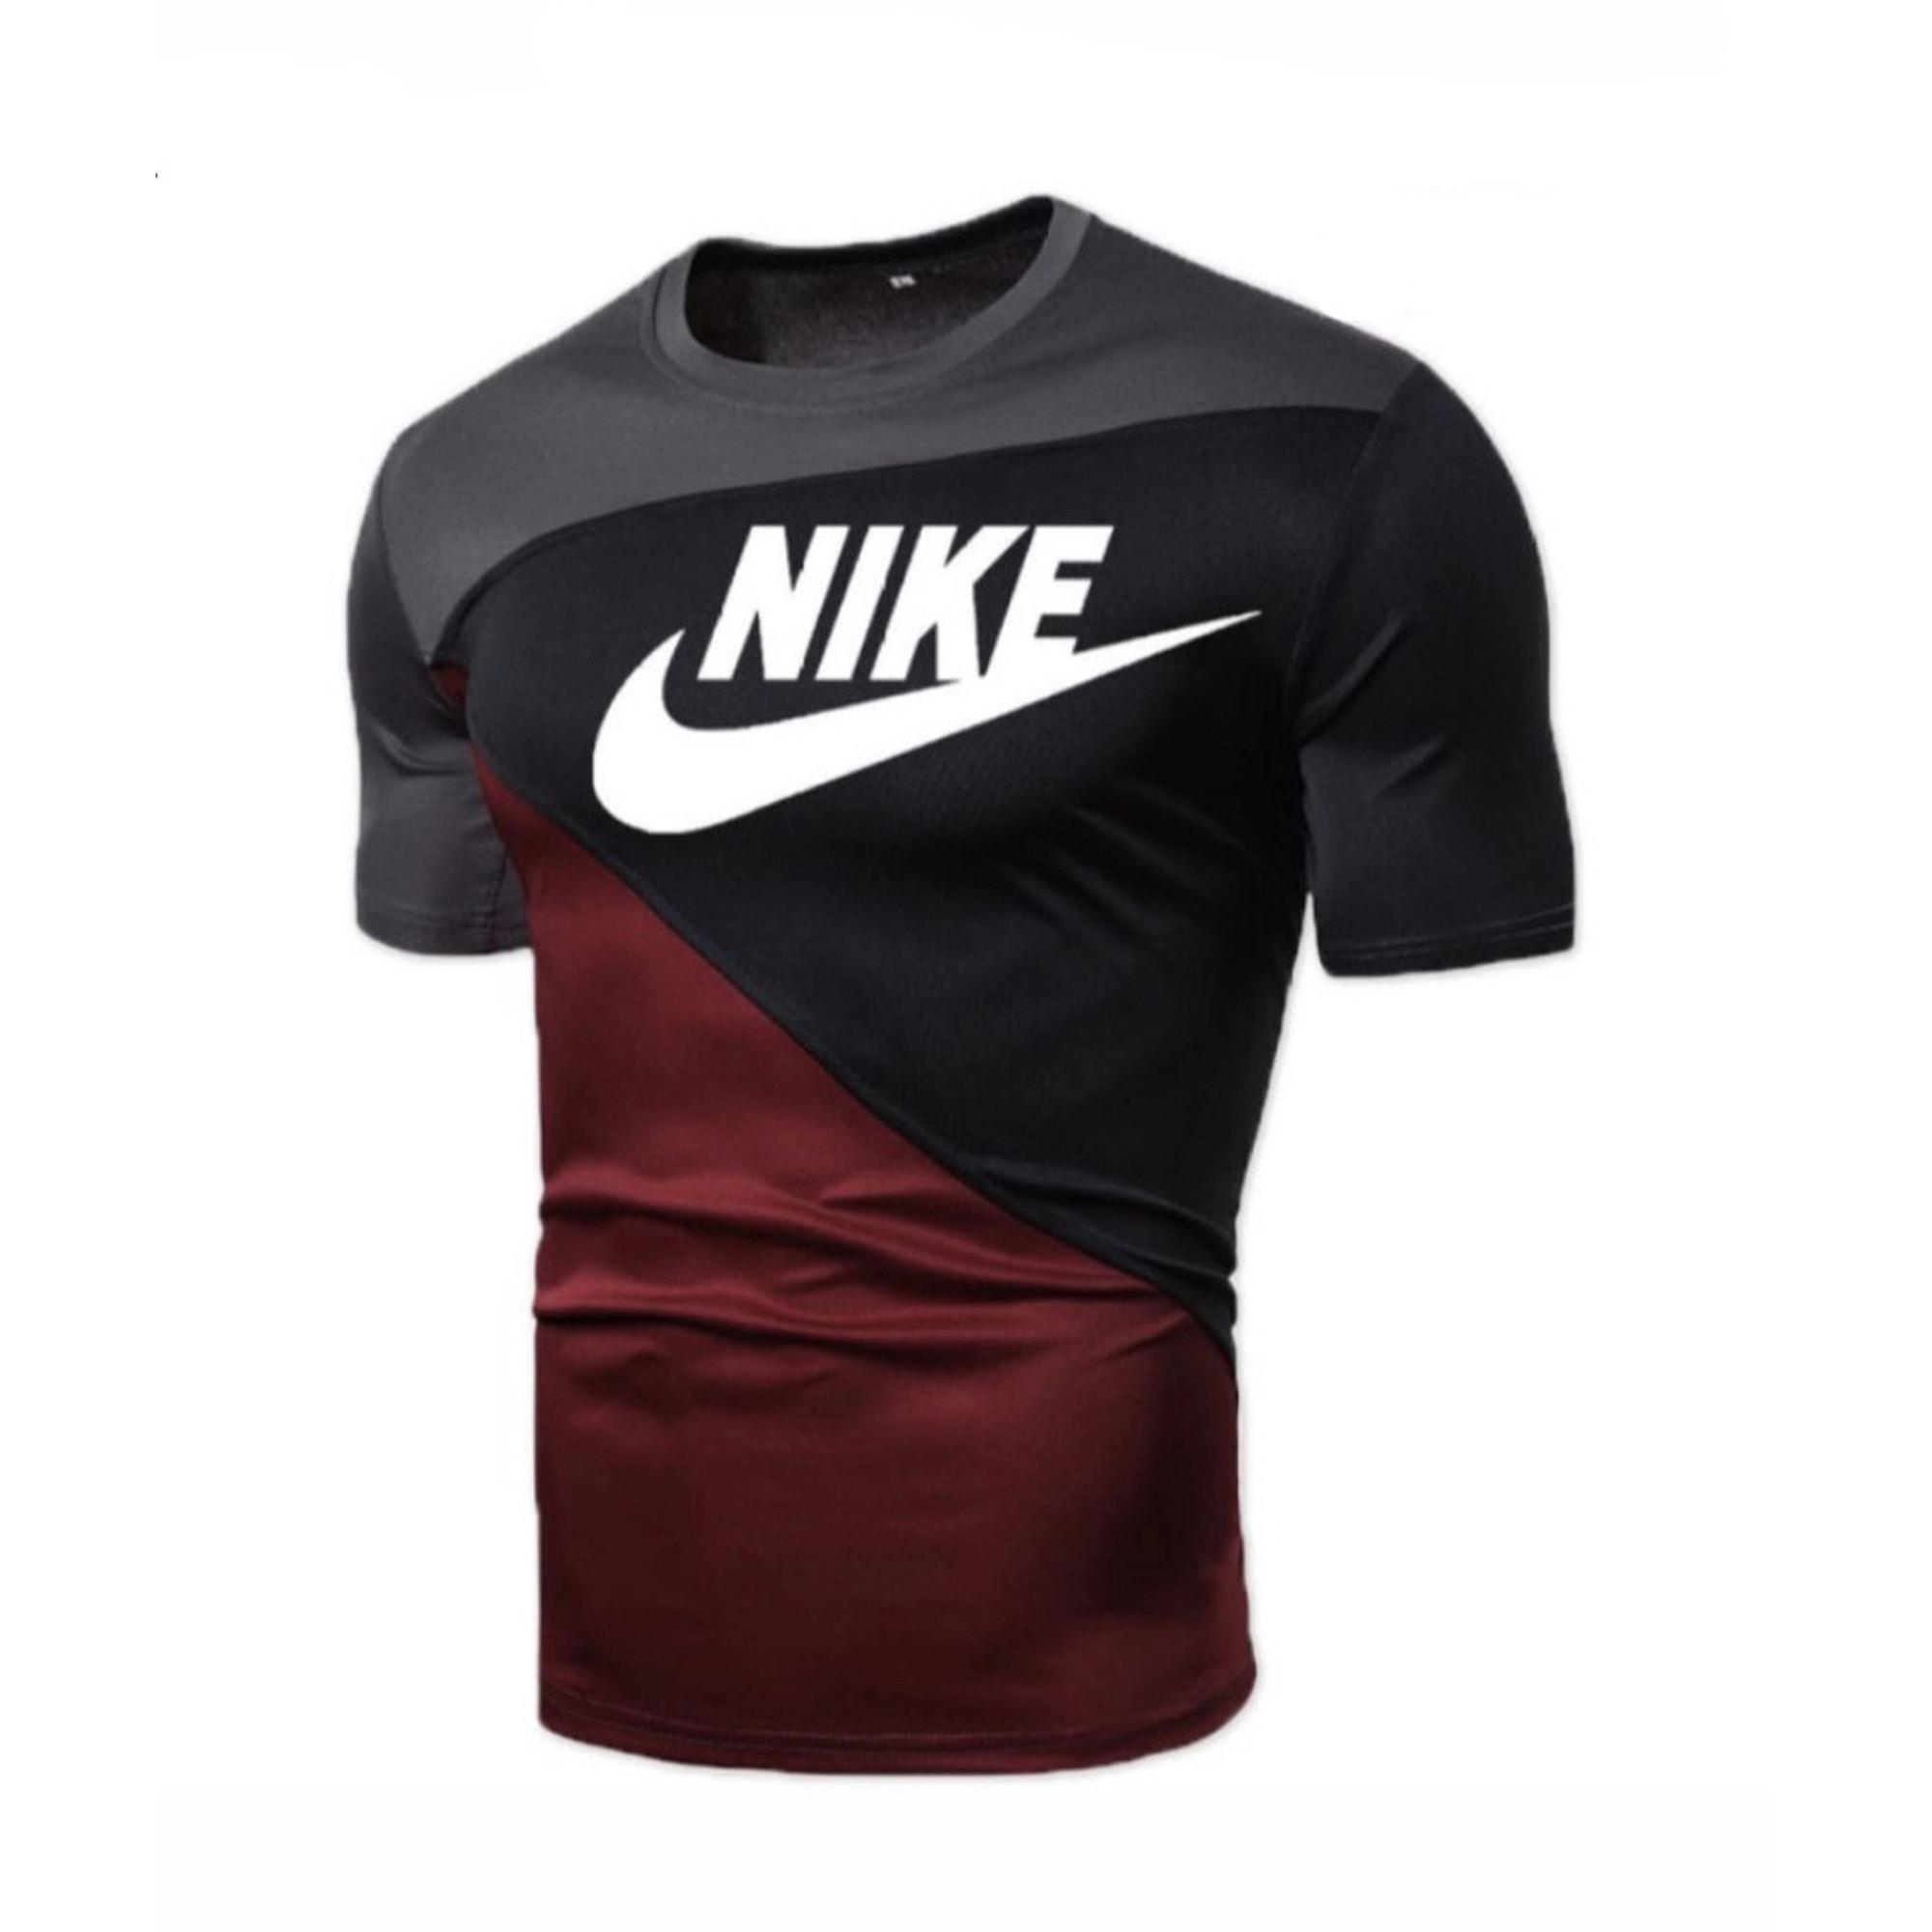 Top, tee-shirt NIKE Gris, anthracite